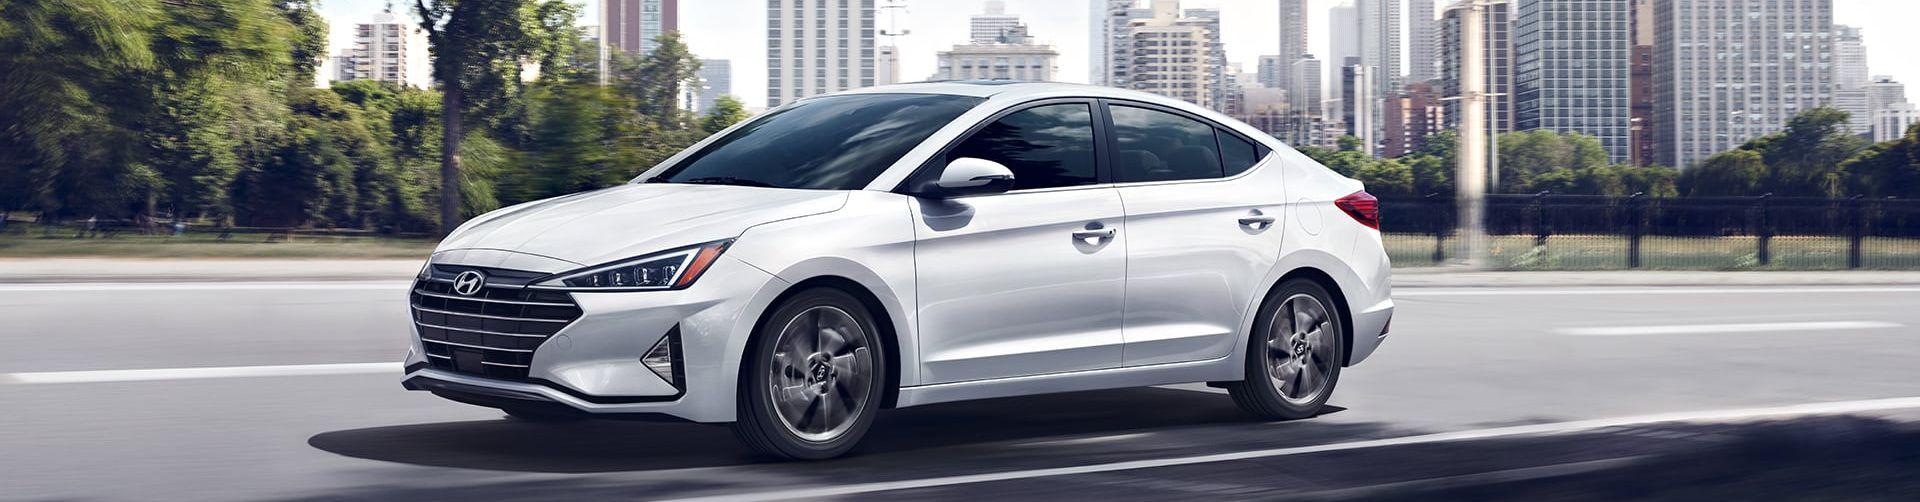 2019 Hyundai Elantra Leasing near Richmond, VA